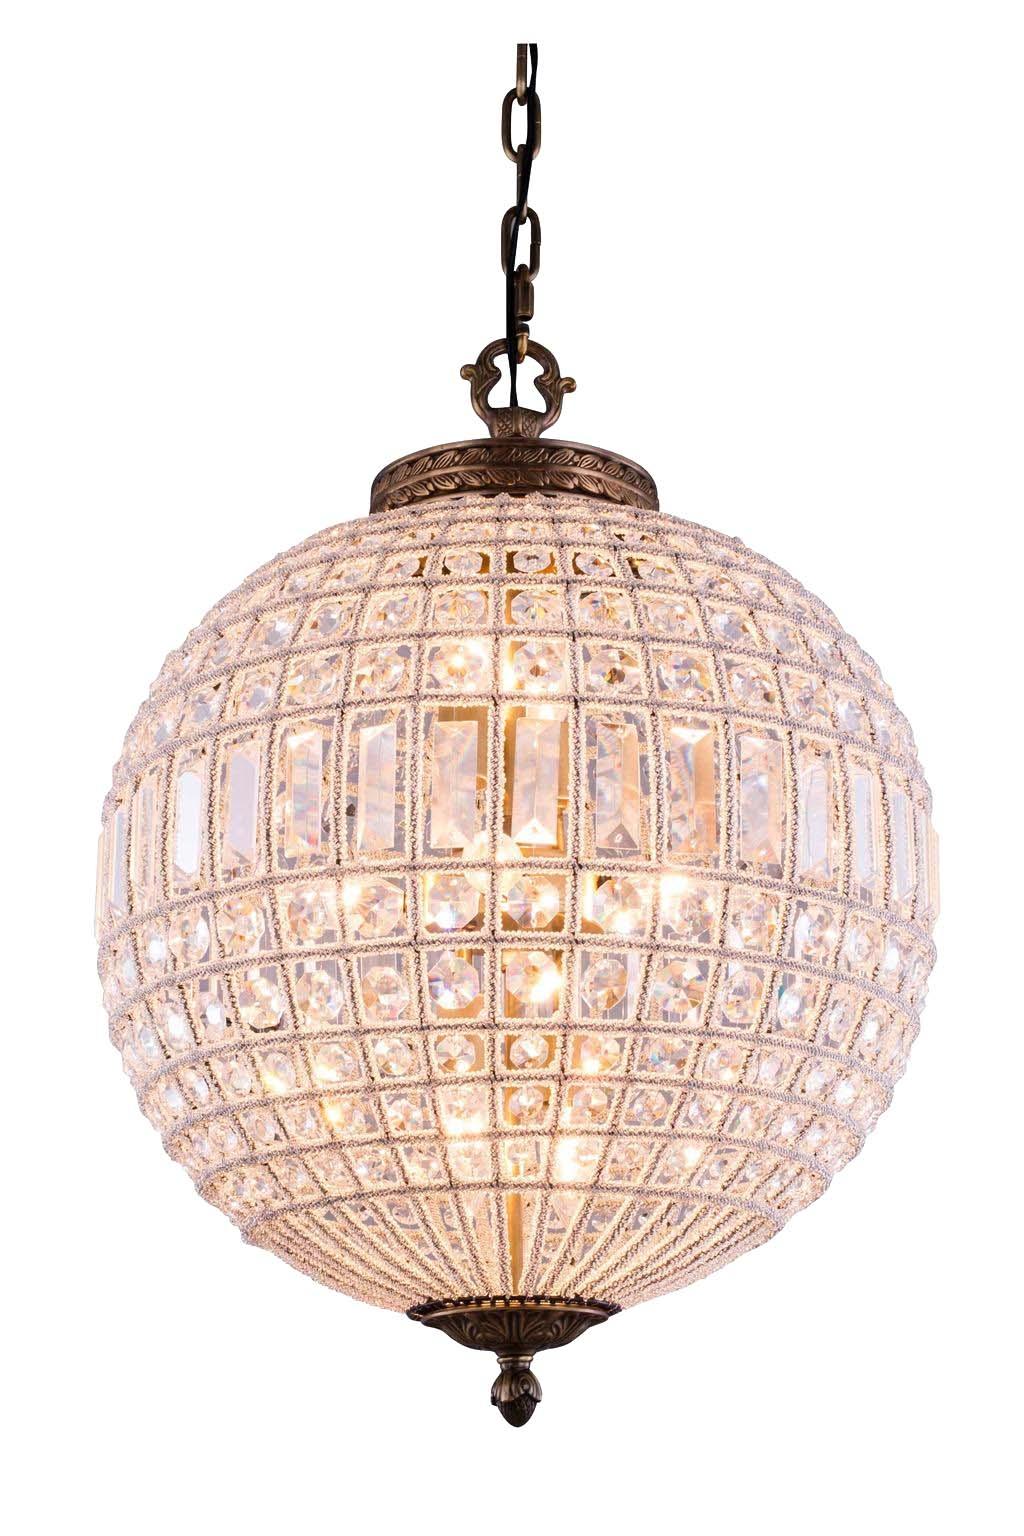 Crystal Globe Chandelier With Regard To Crystal Globe Chandelier (#8 of 12)